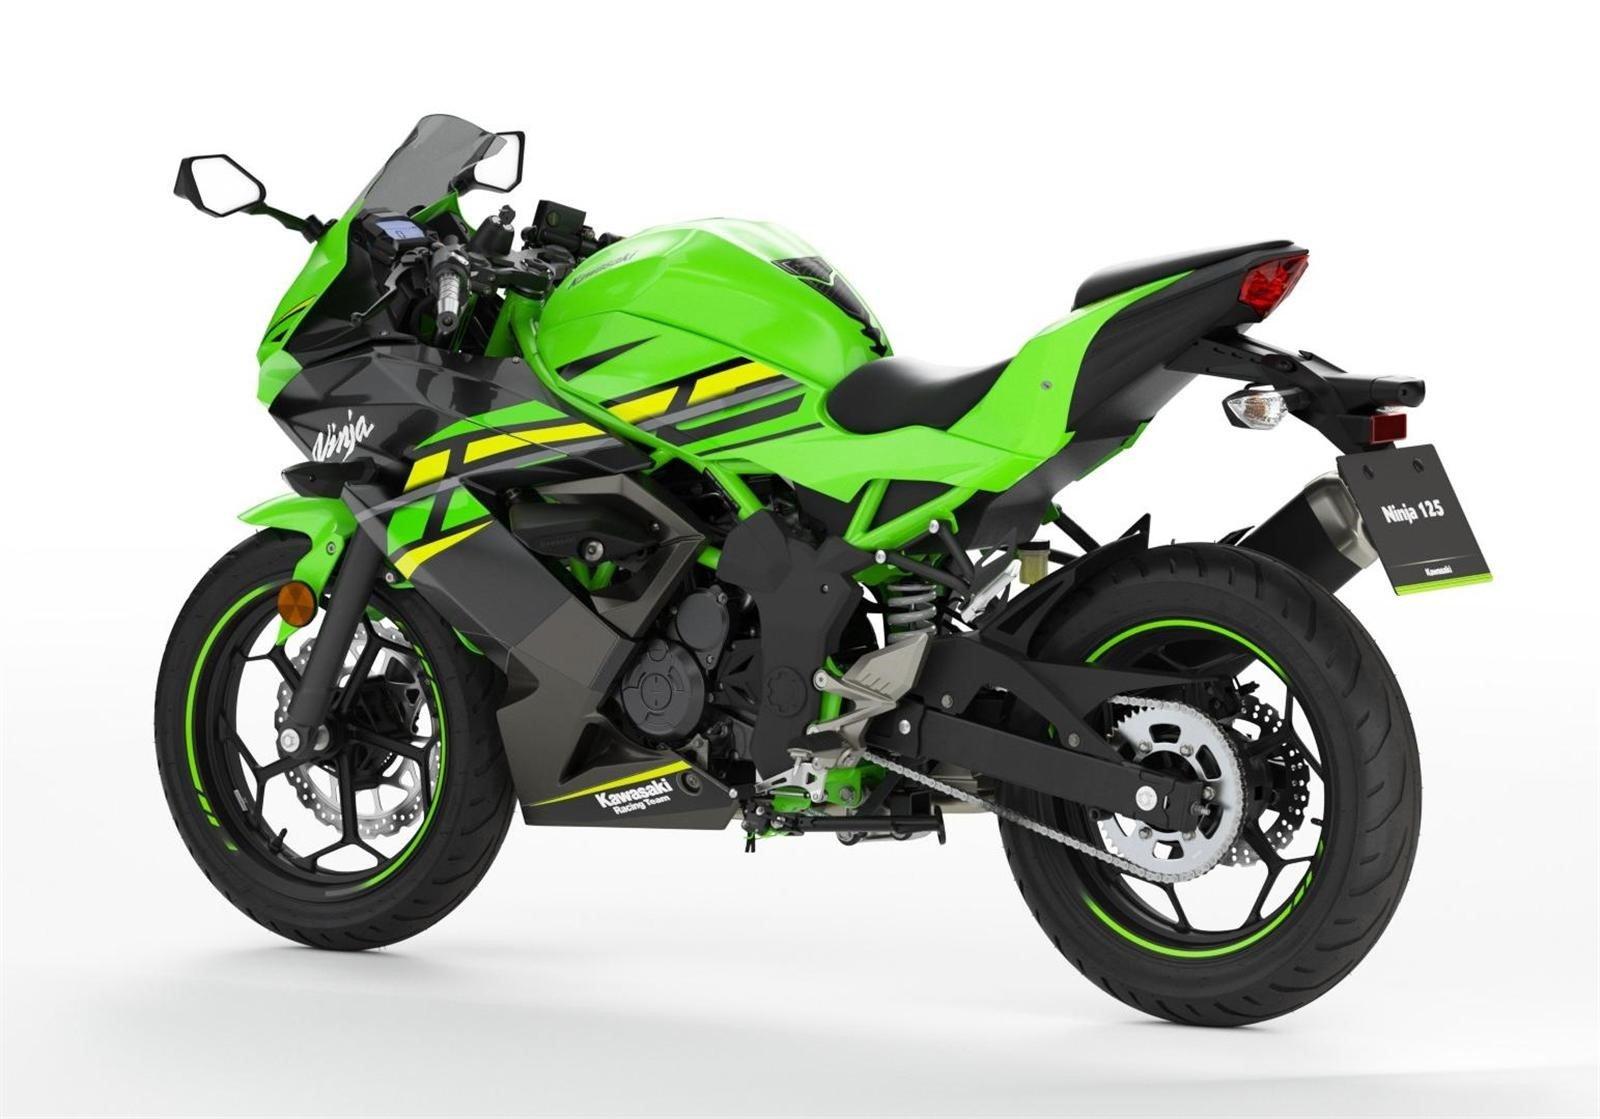 New 2019 Kawasaki Ninja 125 ABS KRT**SAVE £800!!** For Sale (picture 5 of 6)